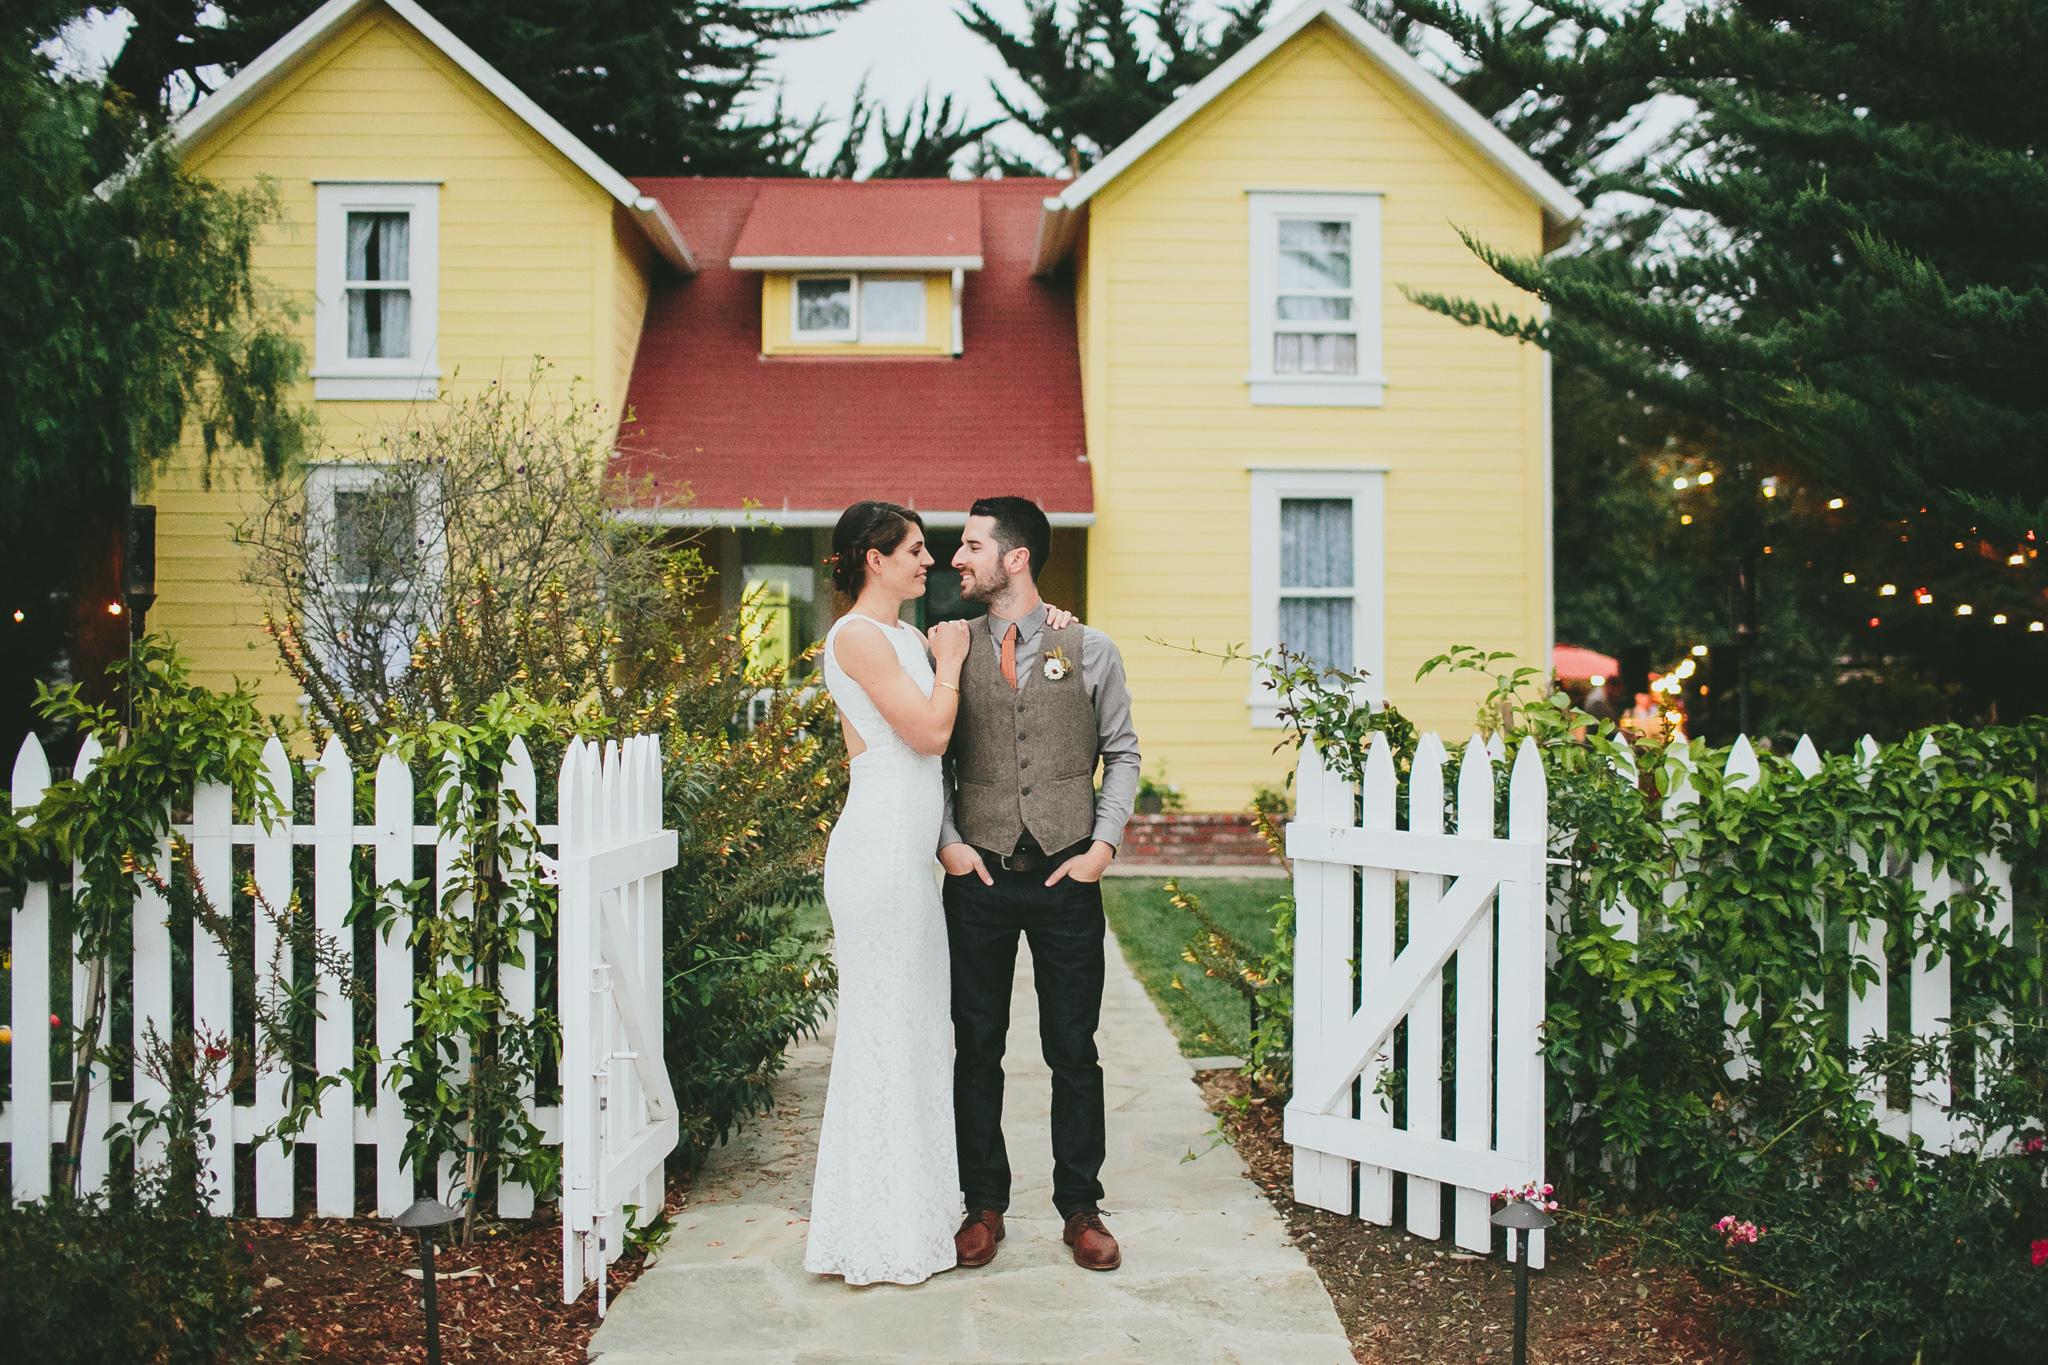 Kelly+Drew-WEDDING_KellyBoitano20160211_0162